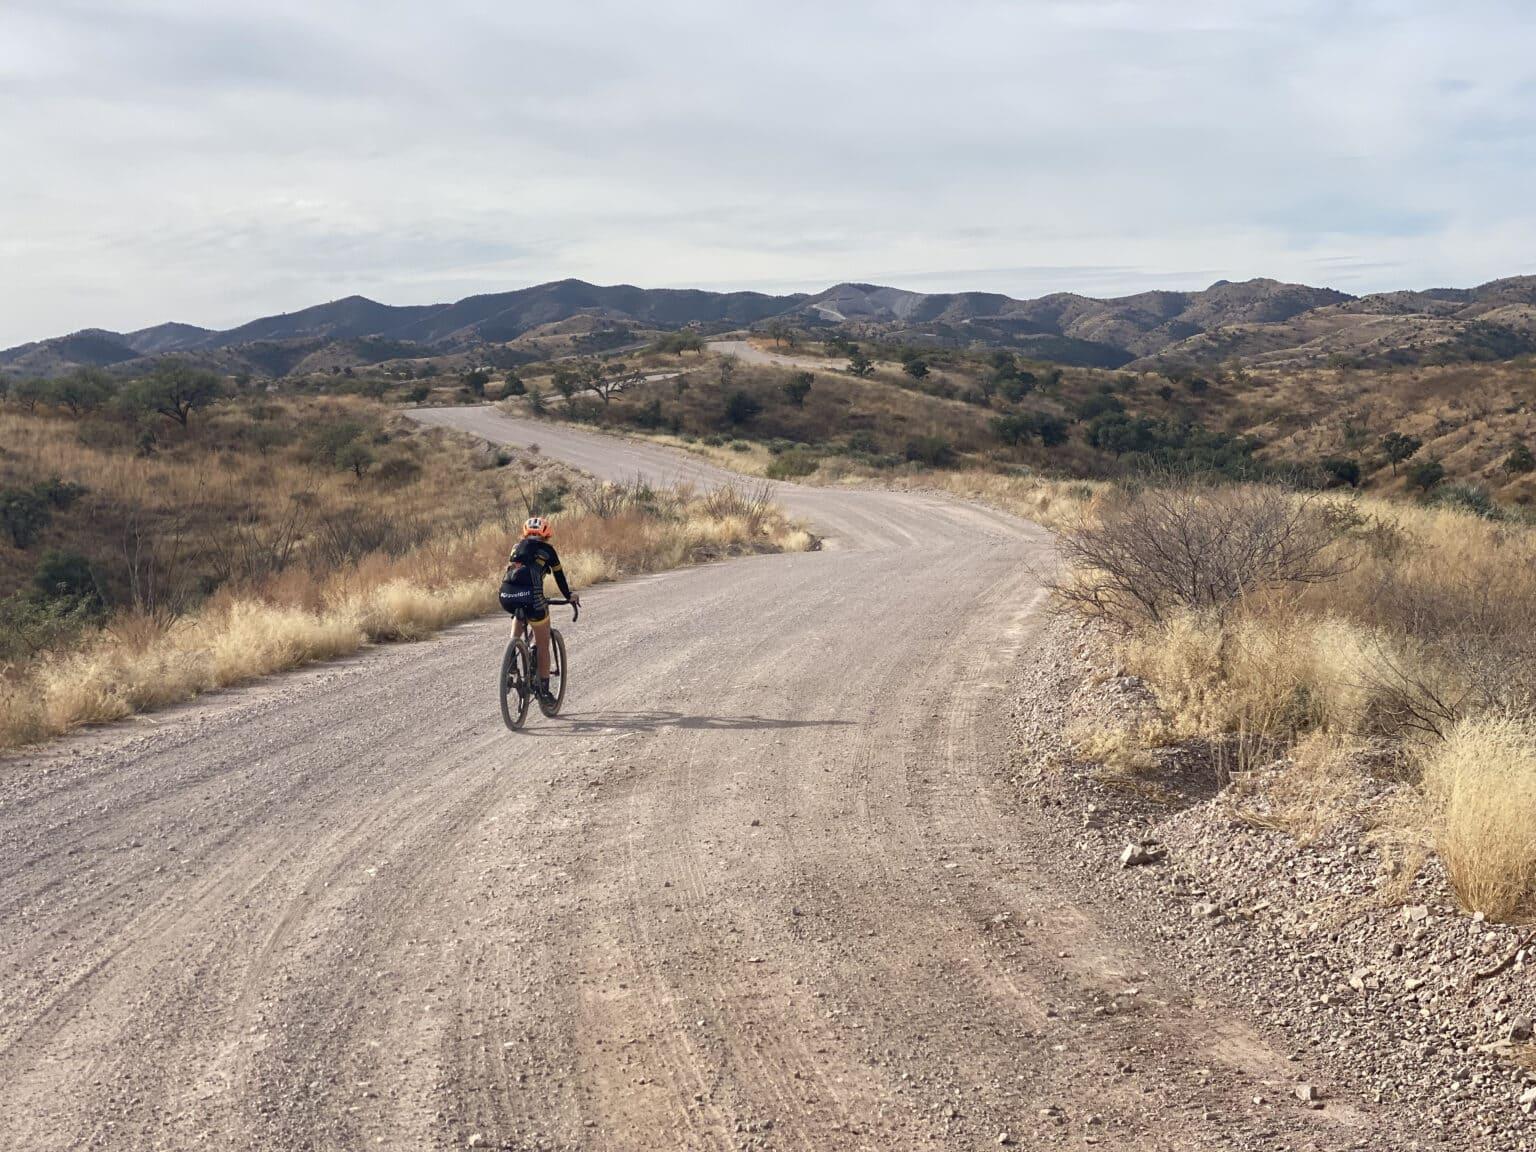 Gravel road near the new border wall in southern Arizona.